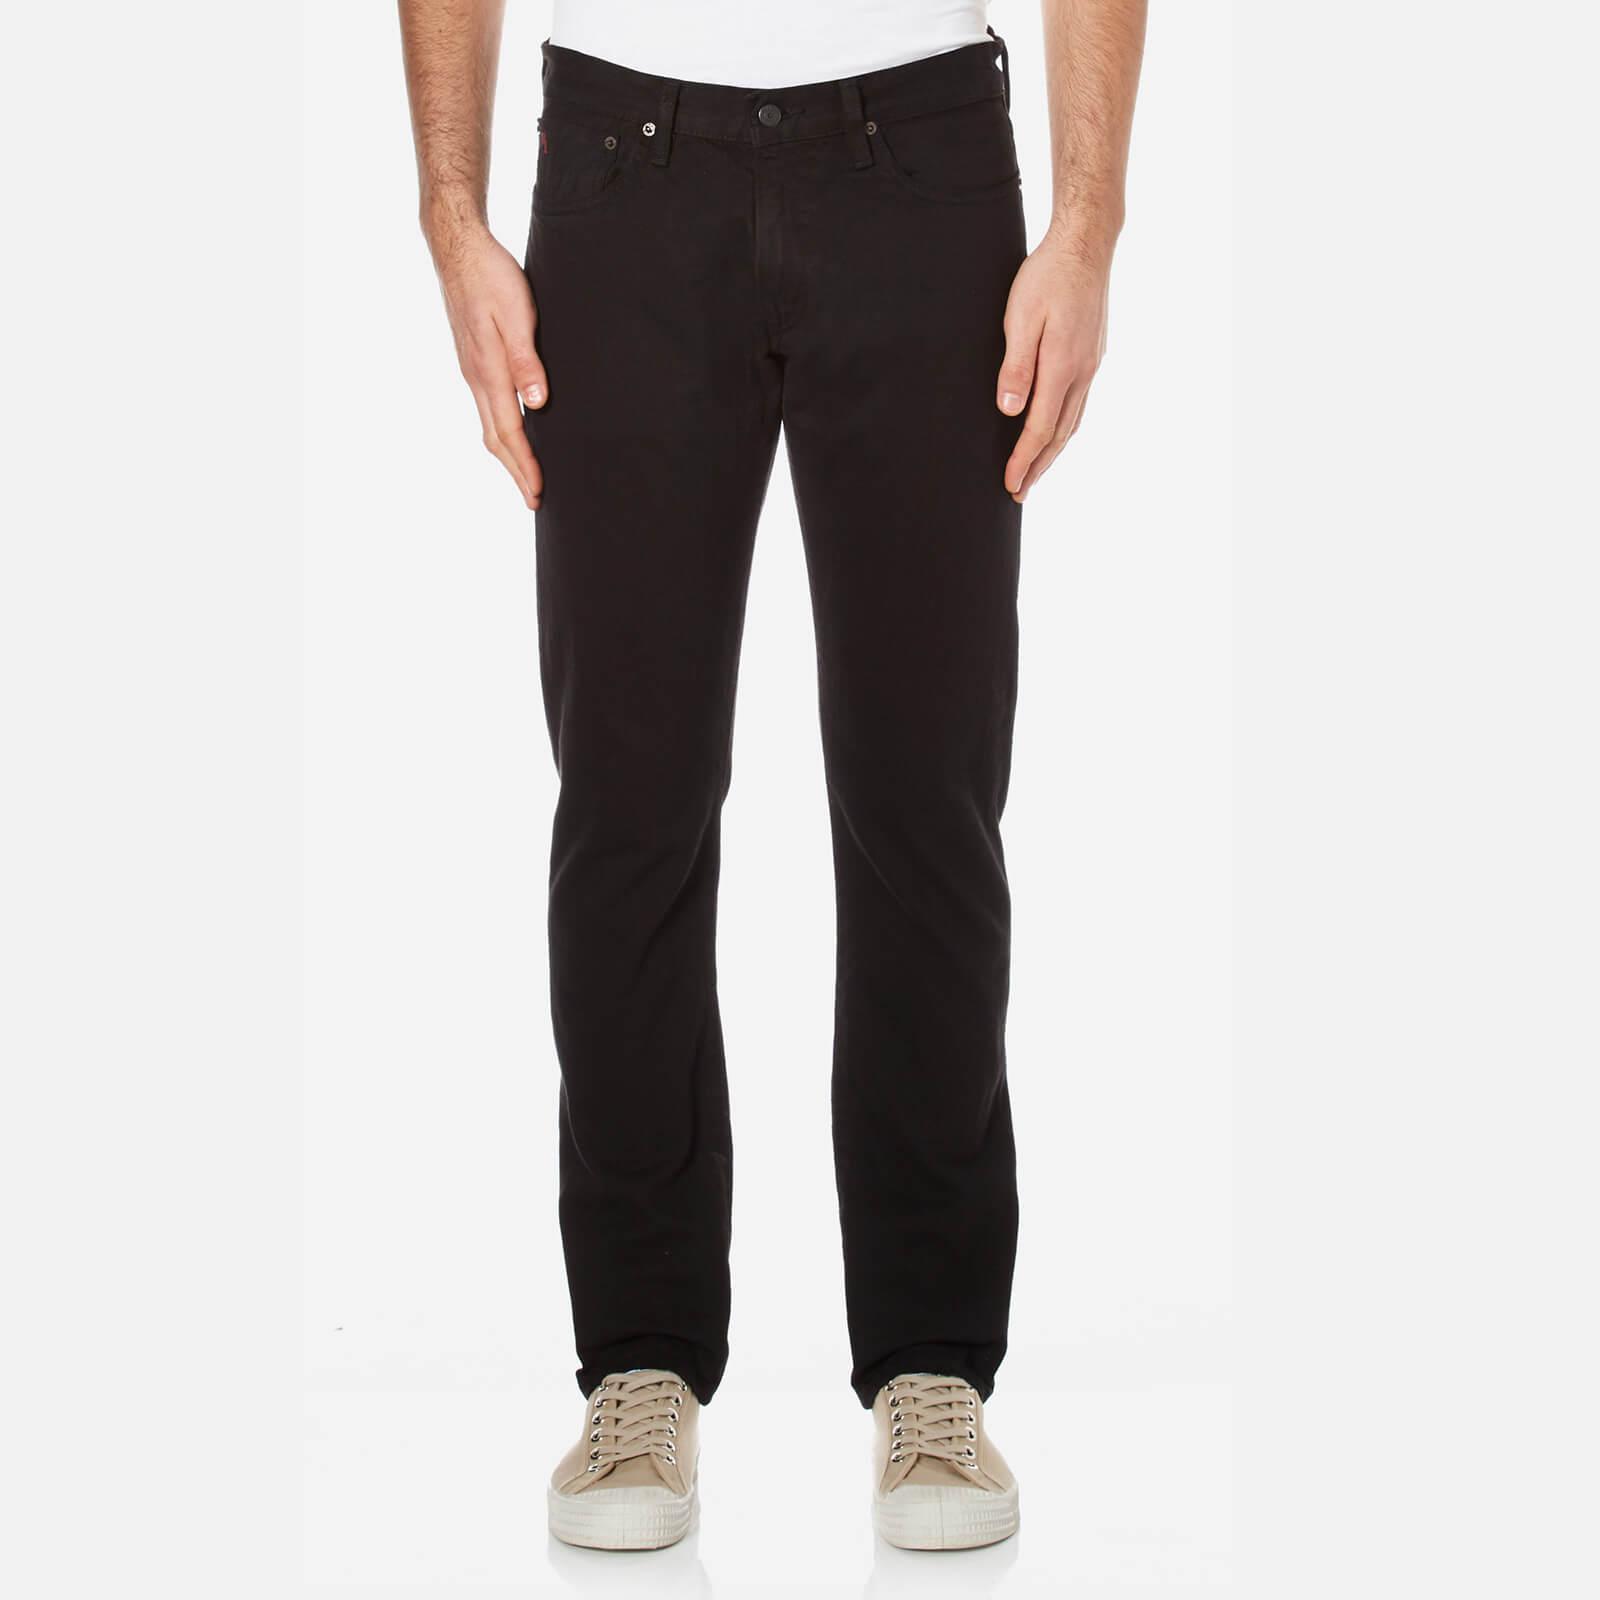 623c85d67b31 Polo Ralph Lauren Men s Sullivan Slim Jeans - Black - Free UK Delivery over  £50